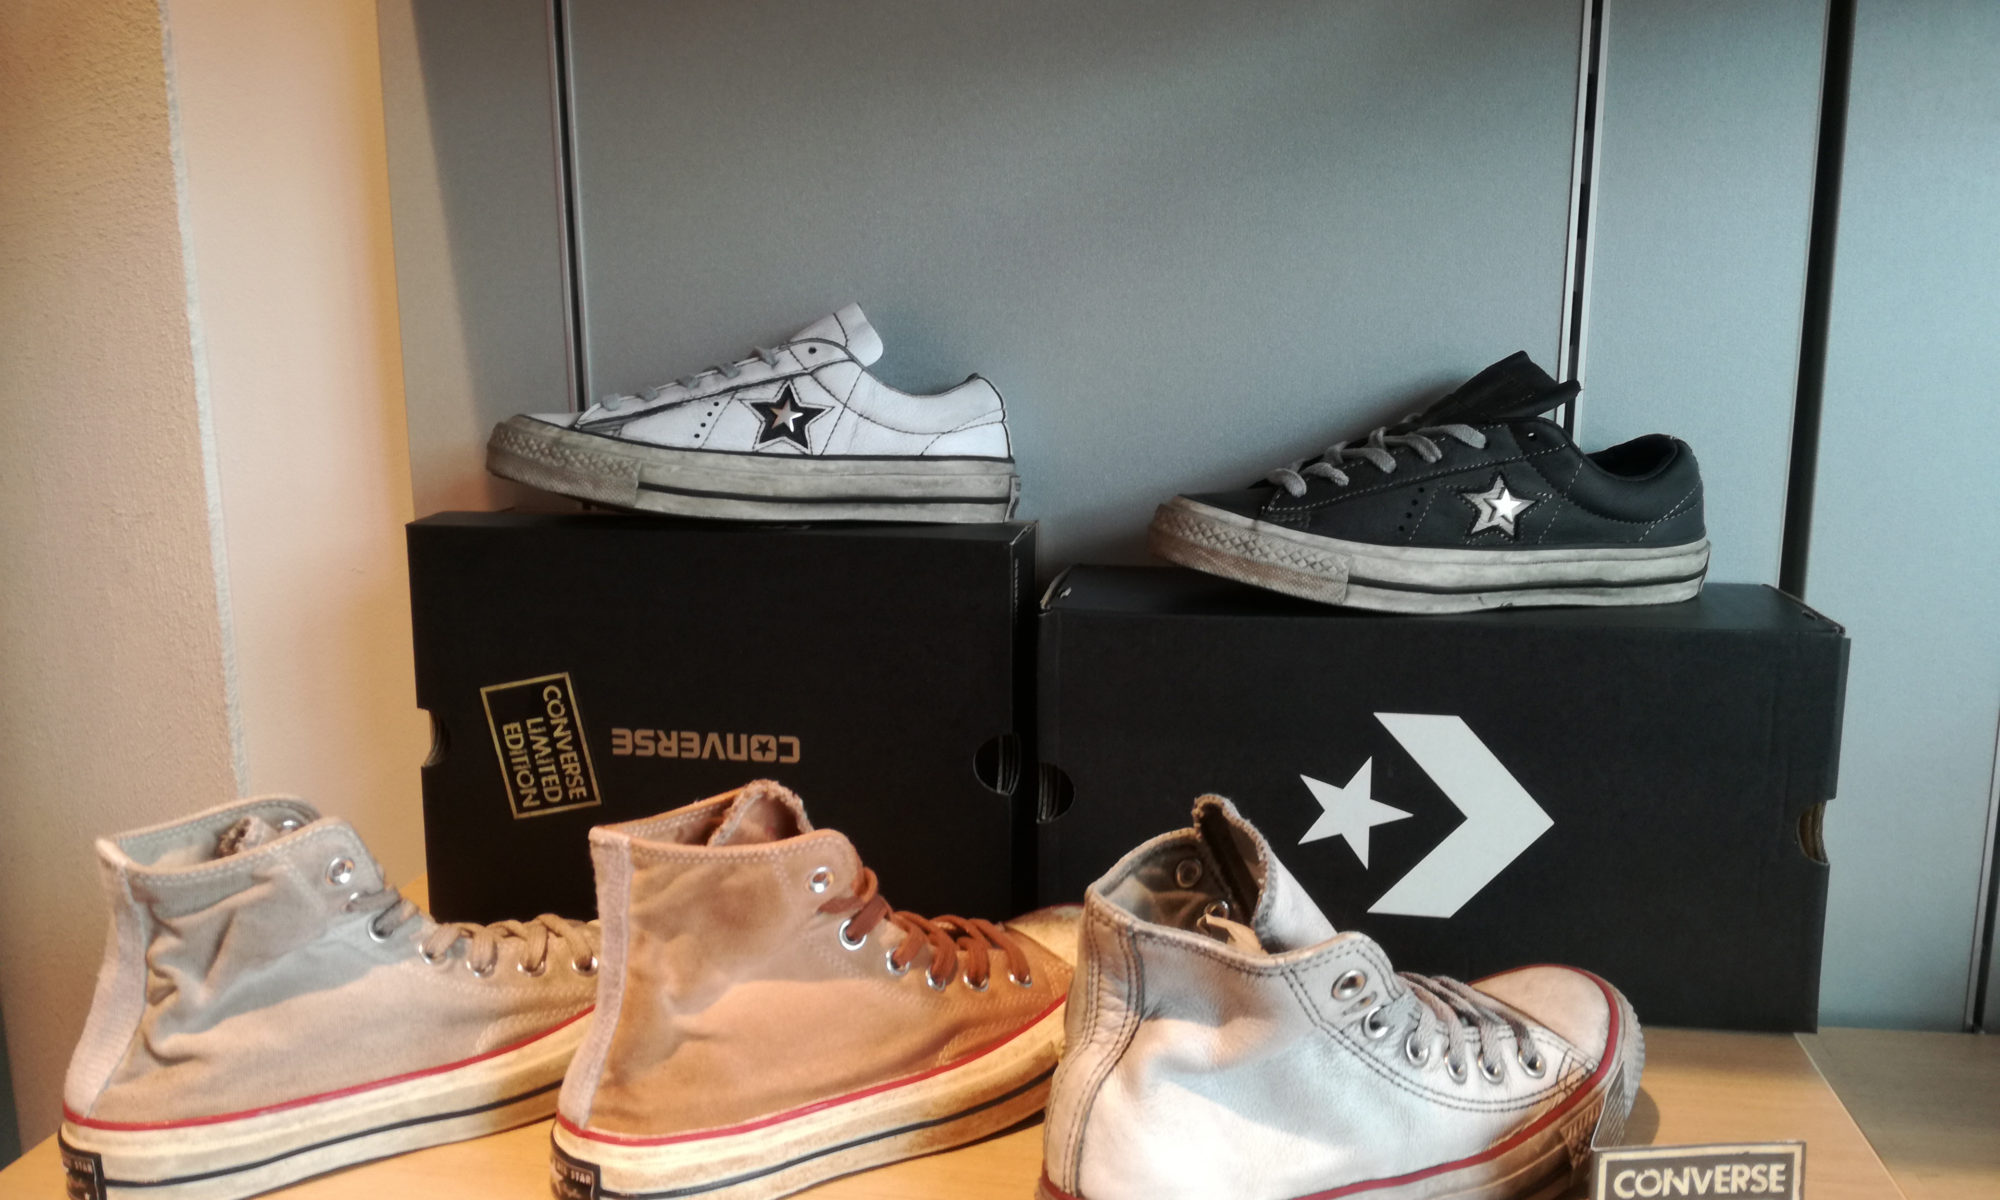 converse Archive Eastside Shoes Sneaker kaufen in Chemnitz